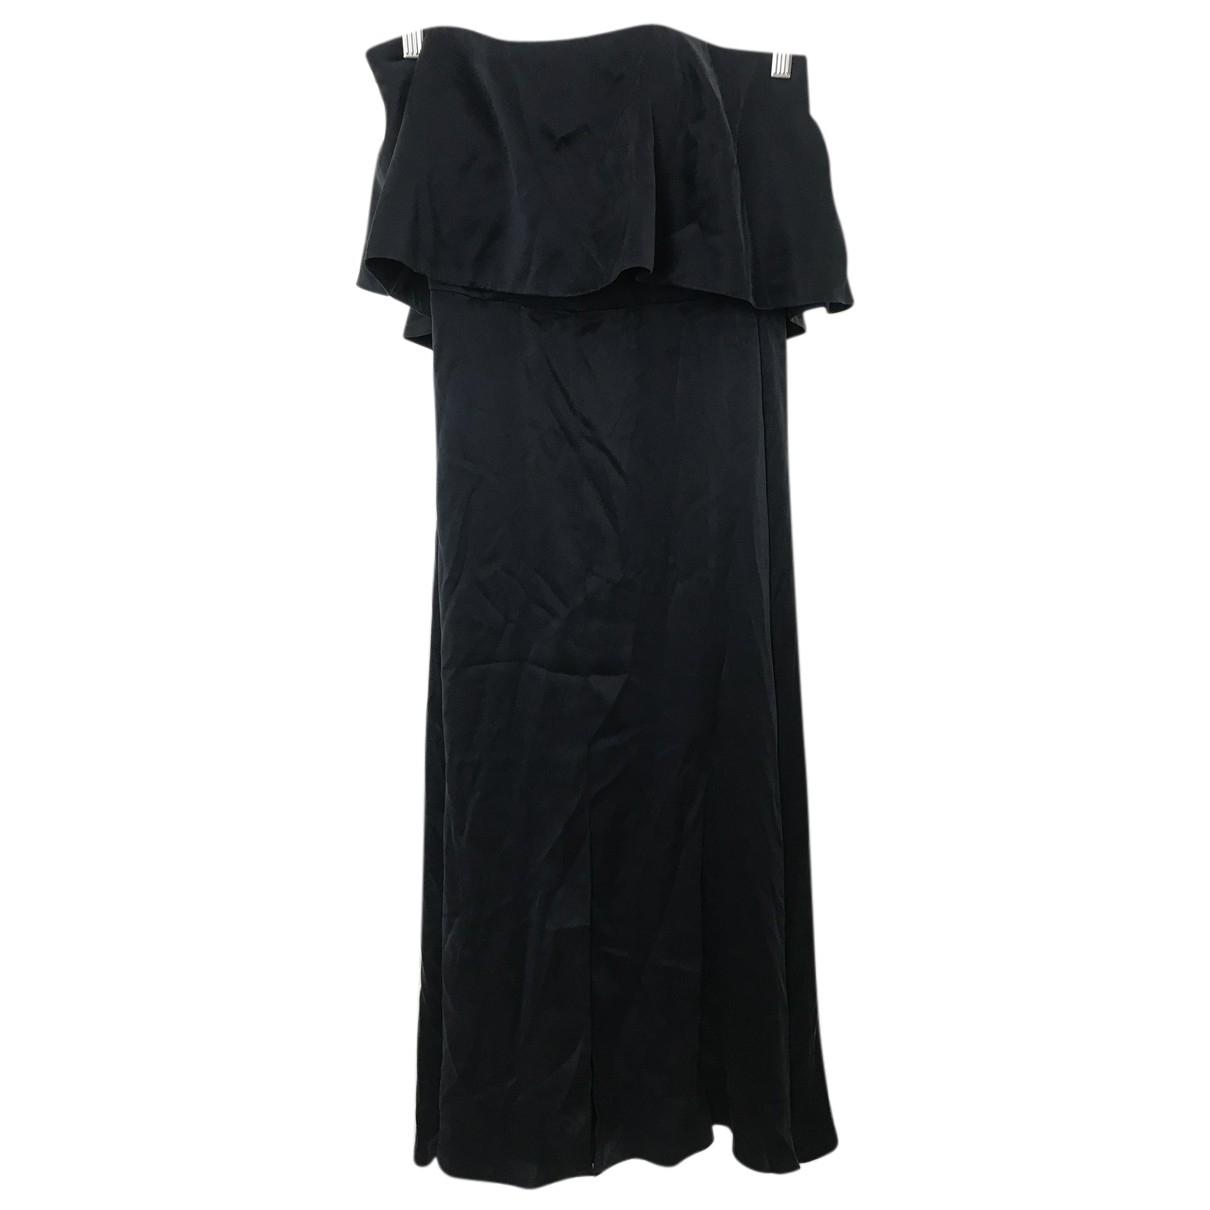 Zimmermann N Navy Silk dress for Women 6 US